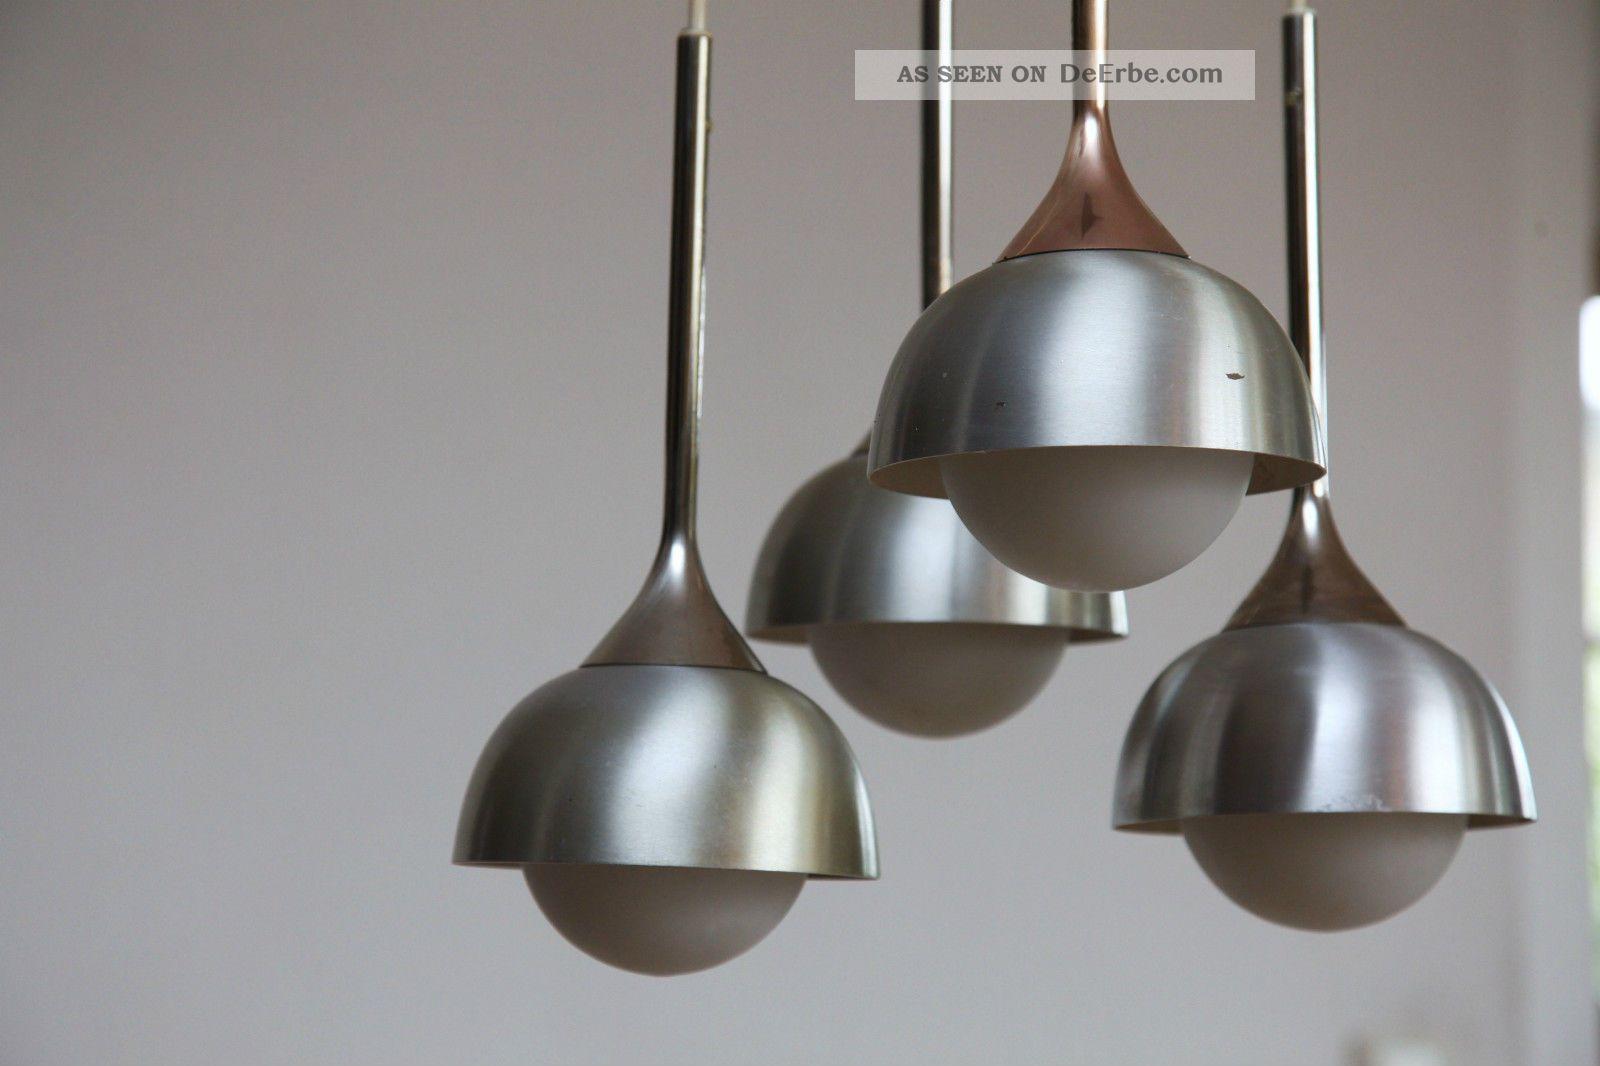 60er 70er 60s Kaskaden Lampe Von Staff Lamp Chrom Panton